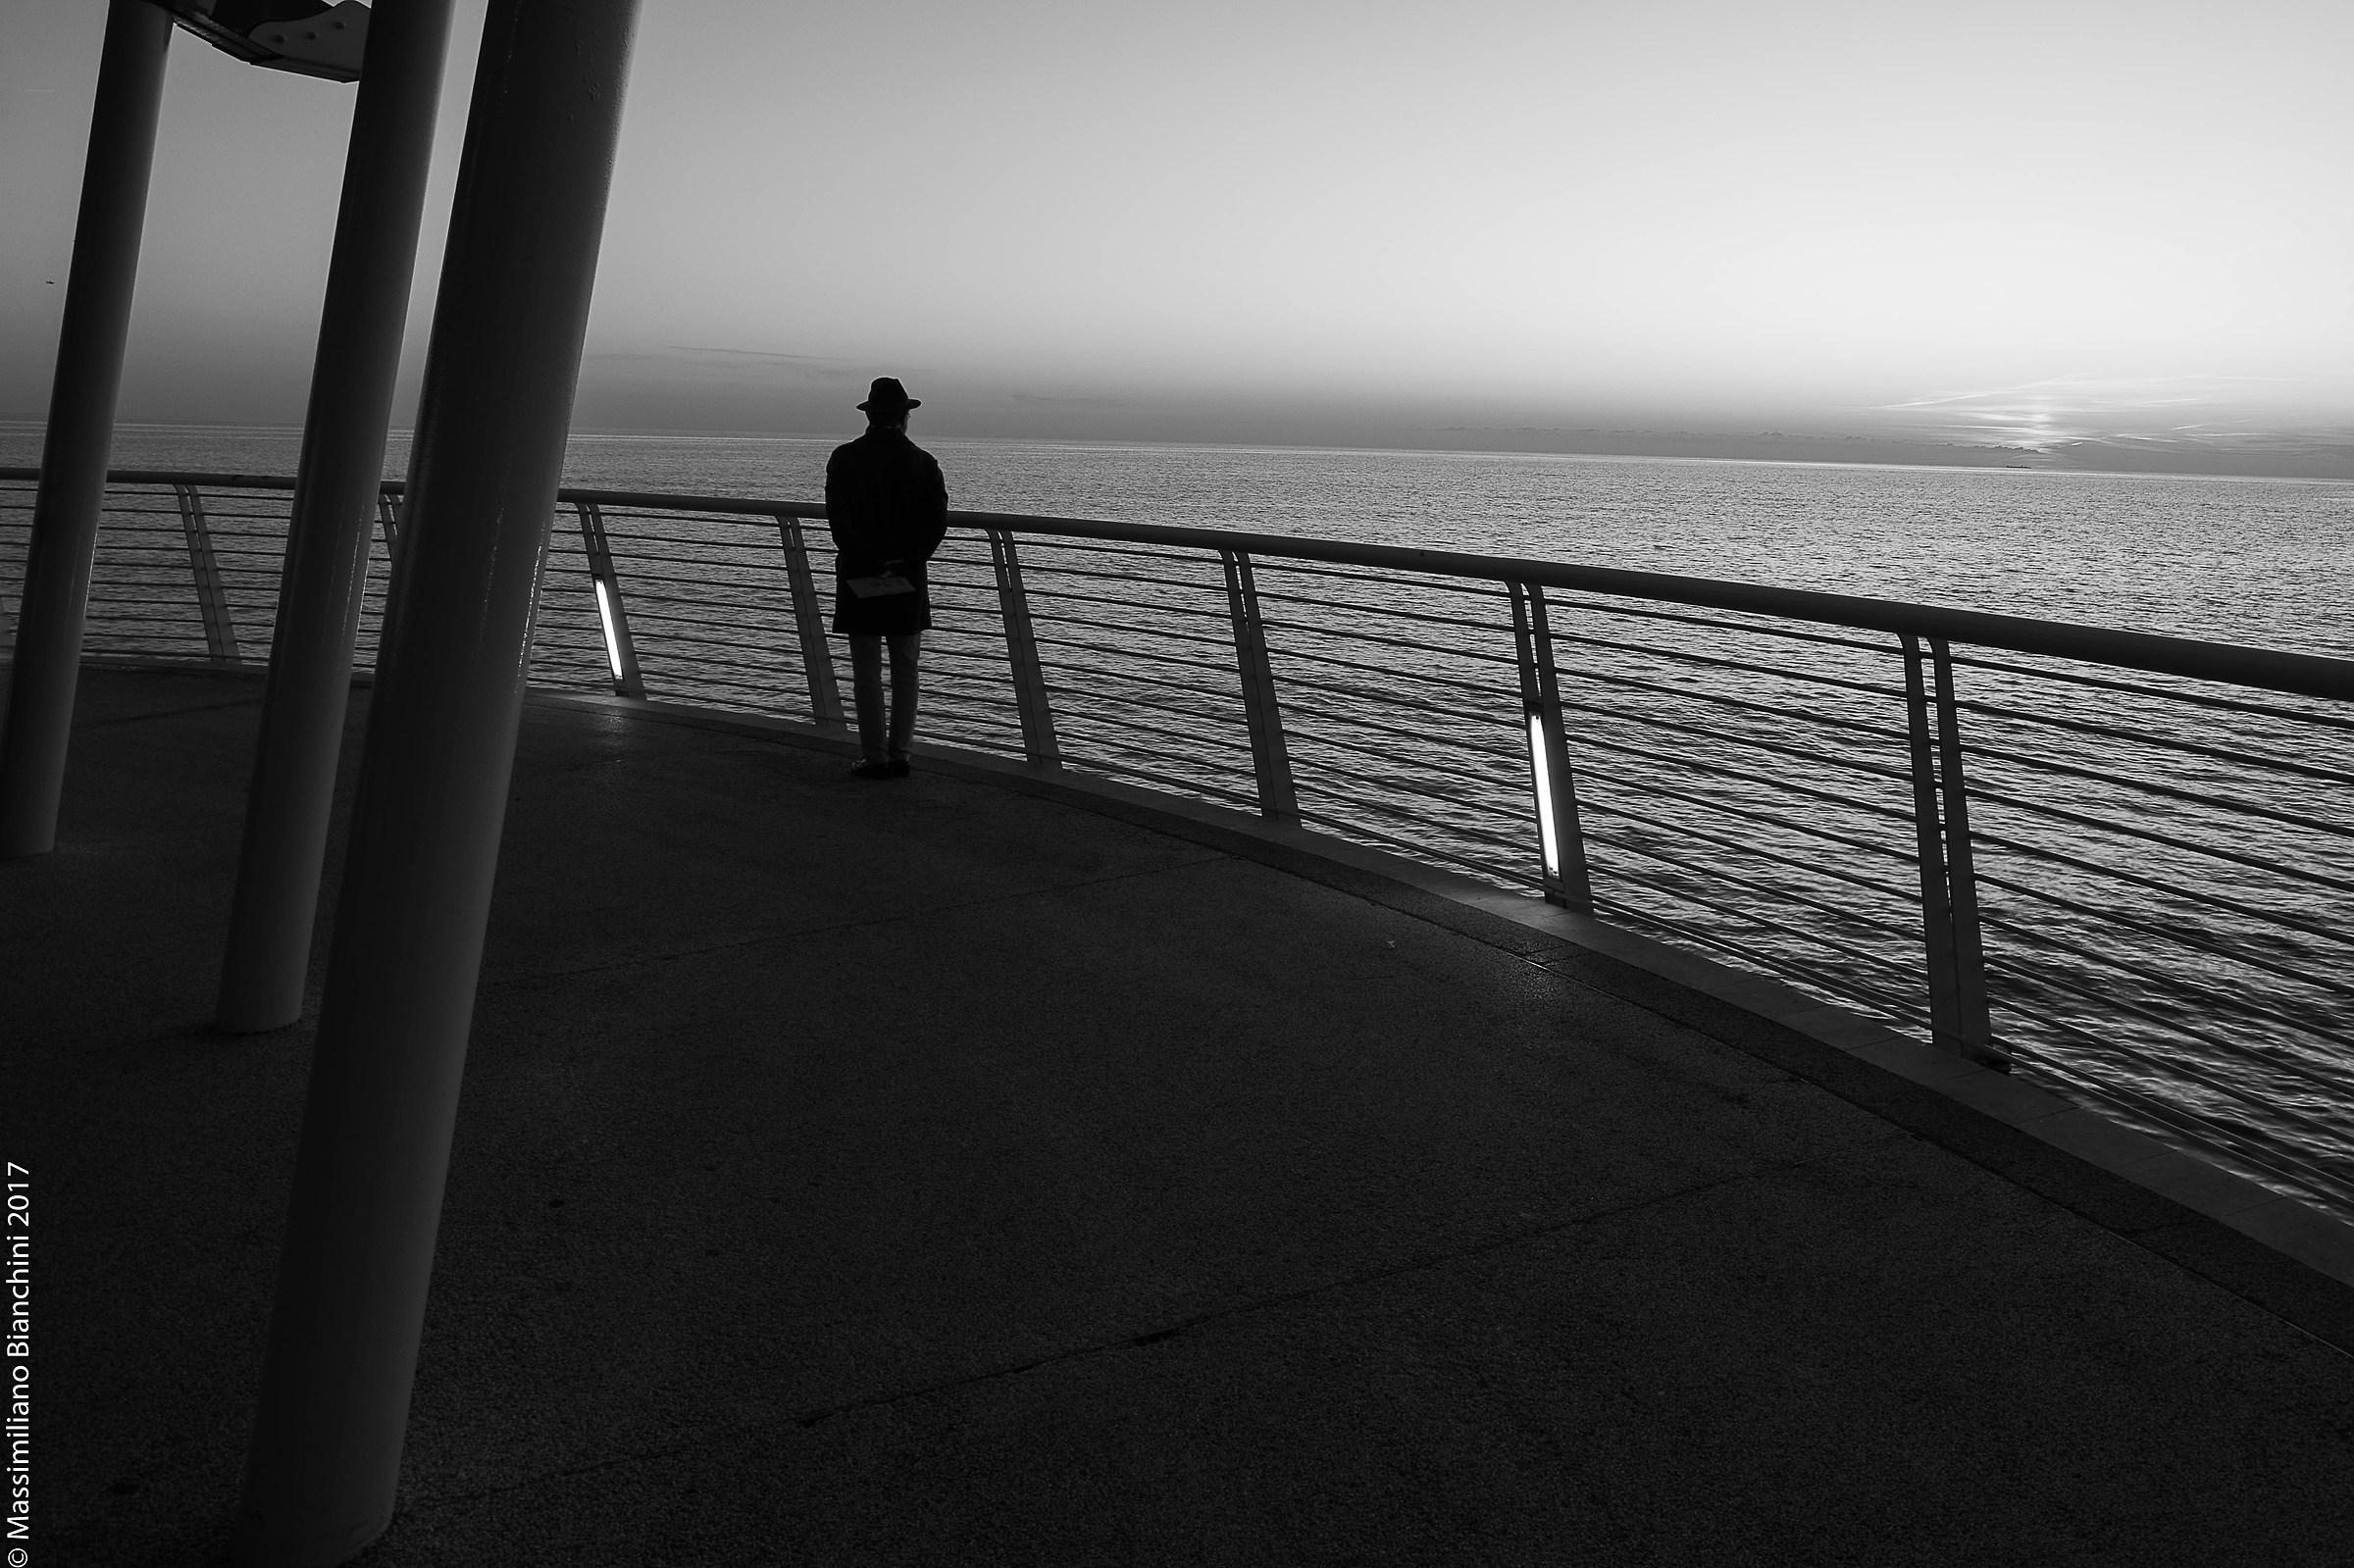 La linea d'ombra...